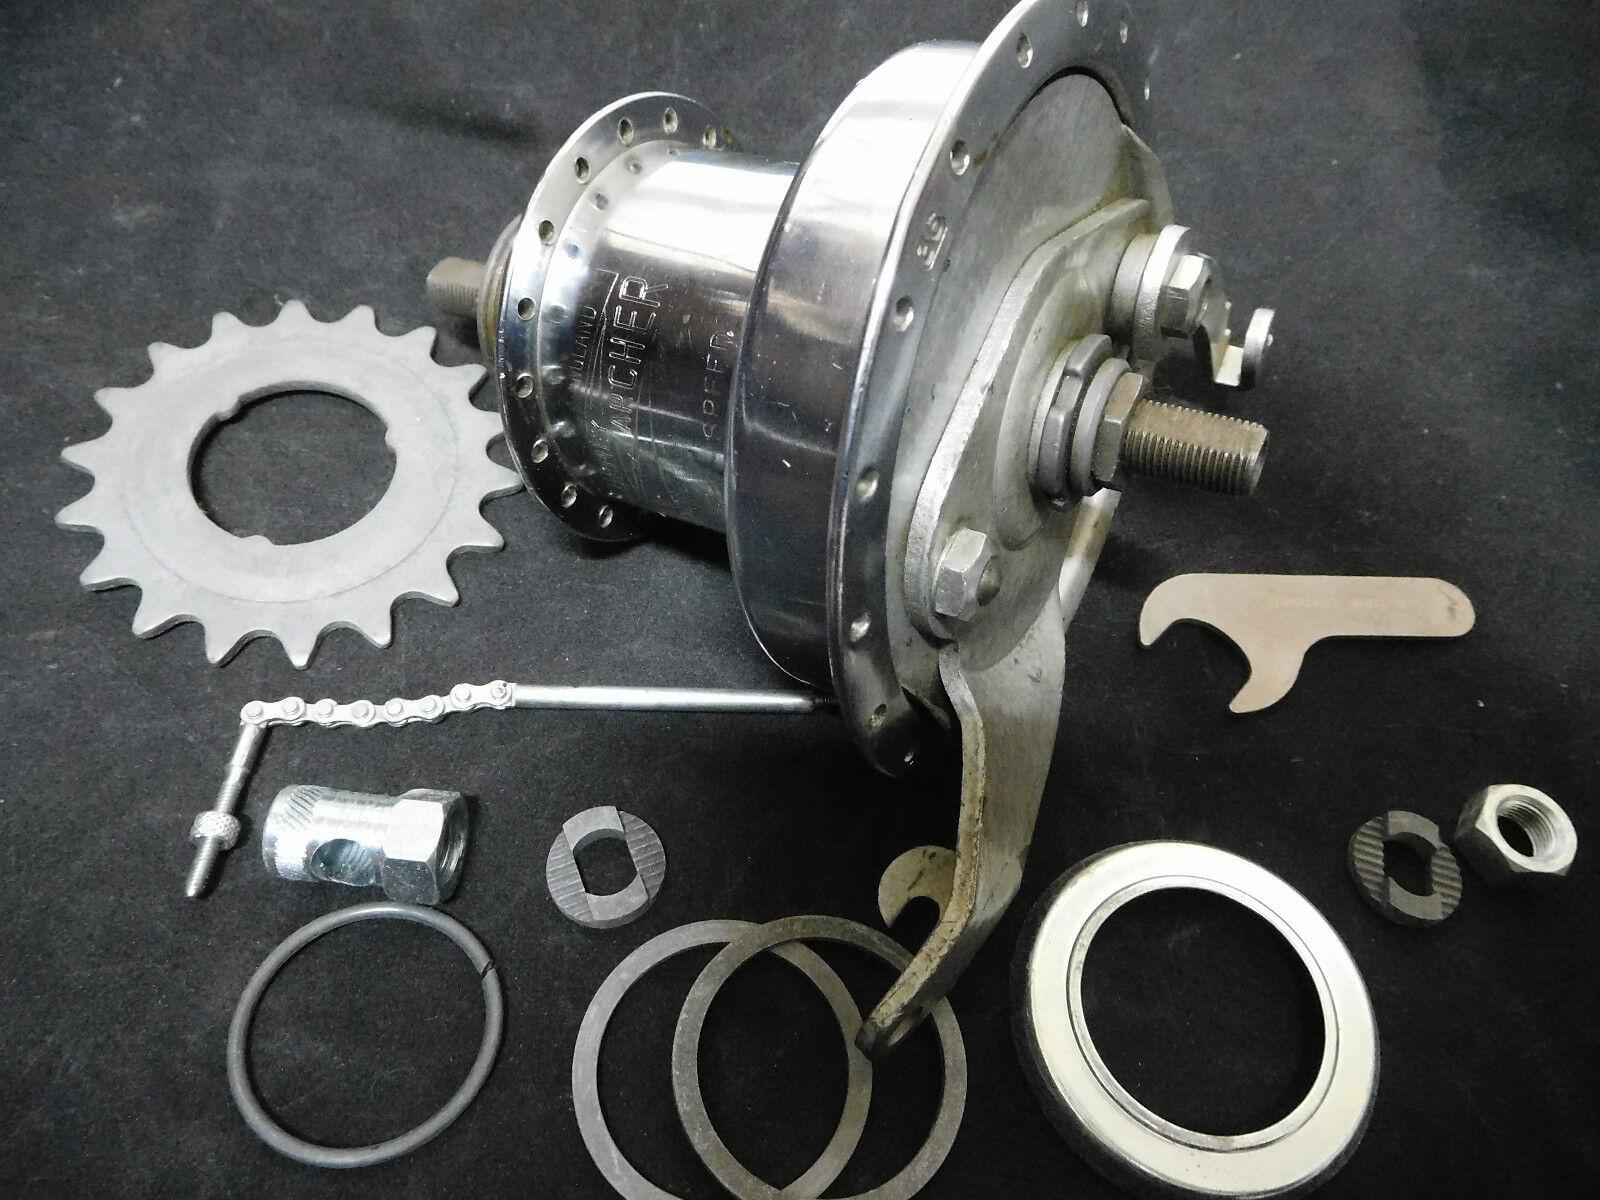 Vintage Sturmey Archer Rear drum brake hub,  36 Holes 3 speed Very rare. NOS 1972  save up to 50%